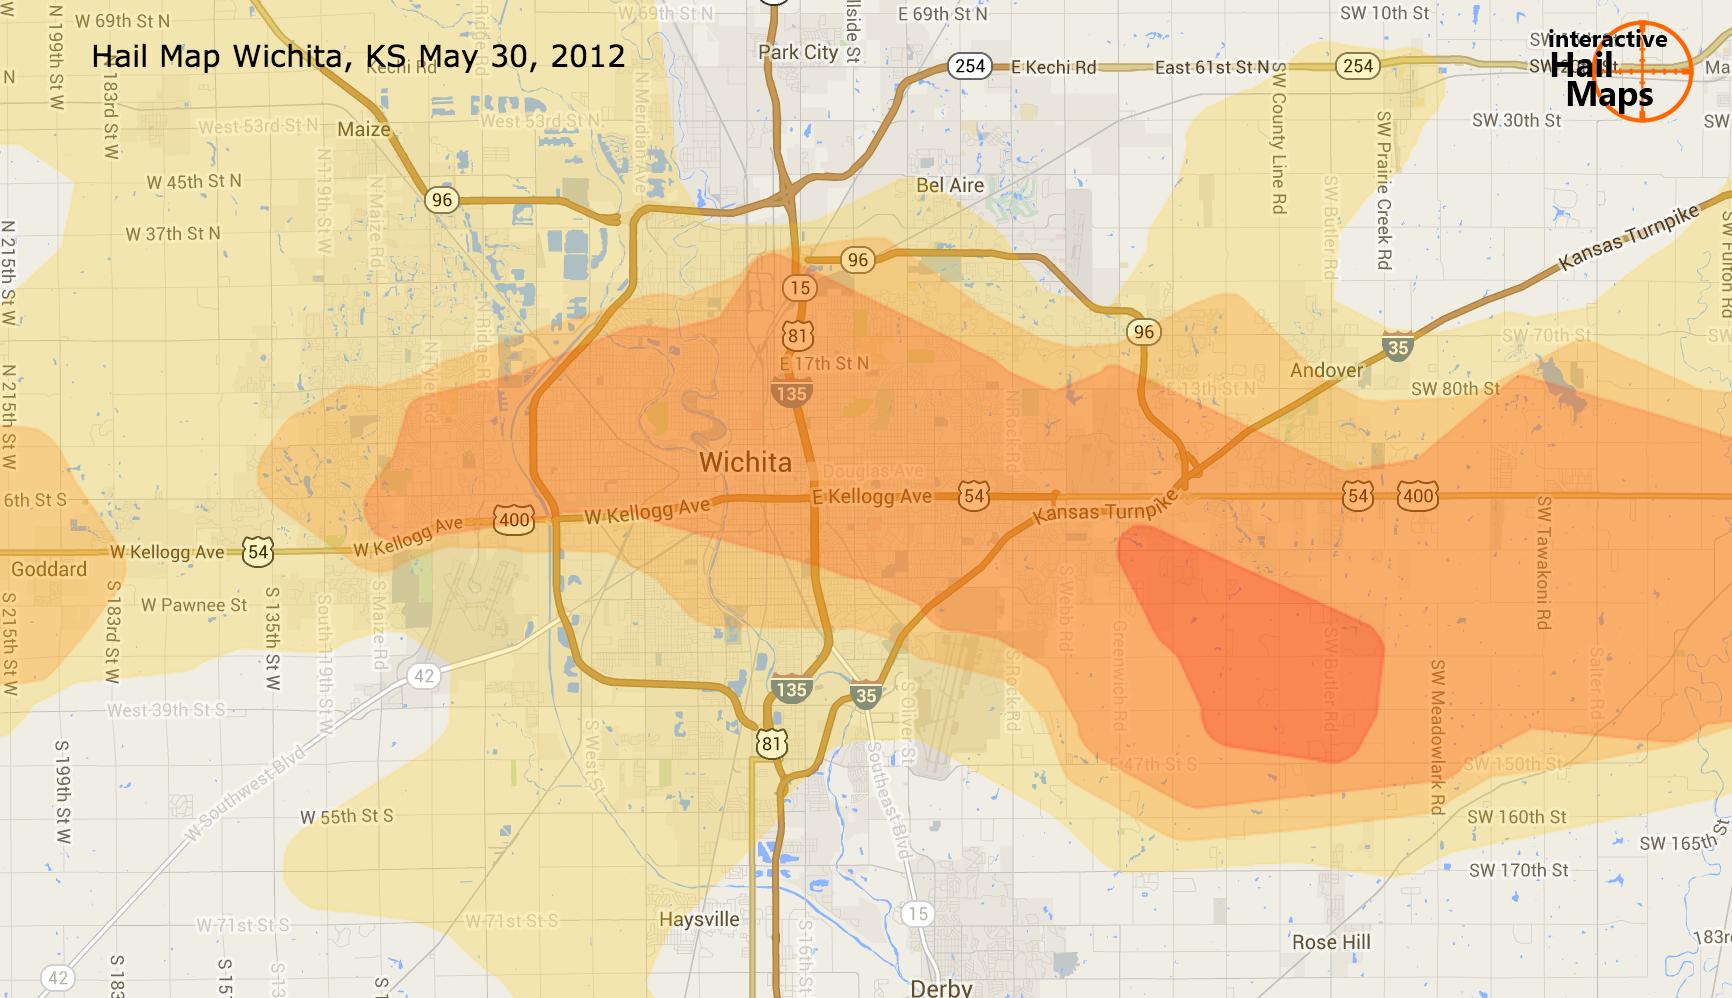 Hail Map Wichita KS May 30 2012